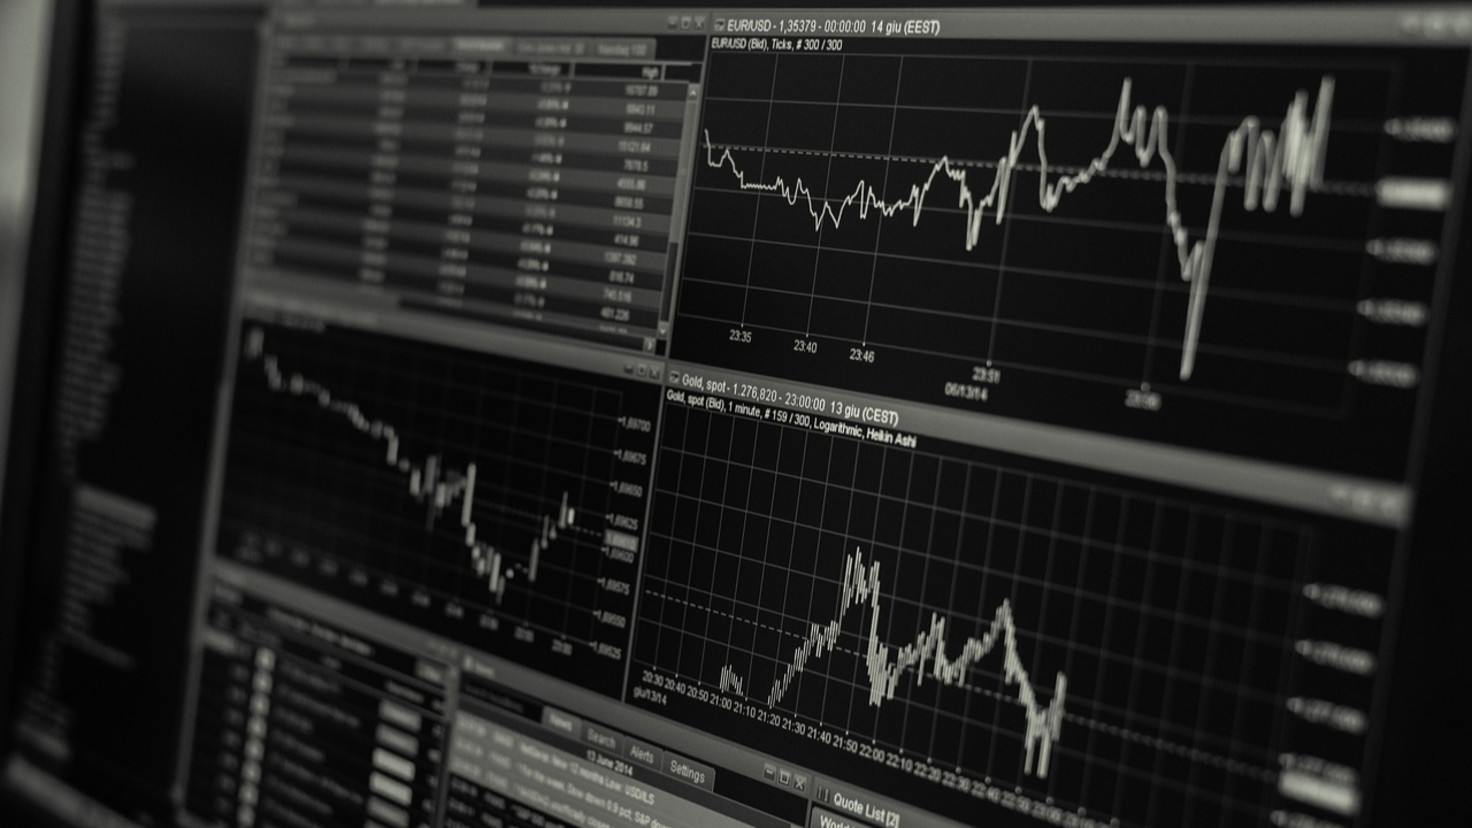 Риски на максимум: куда потекут капиталы после решения ФРС?